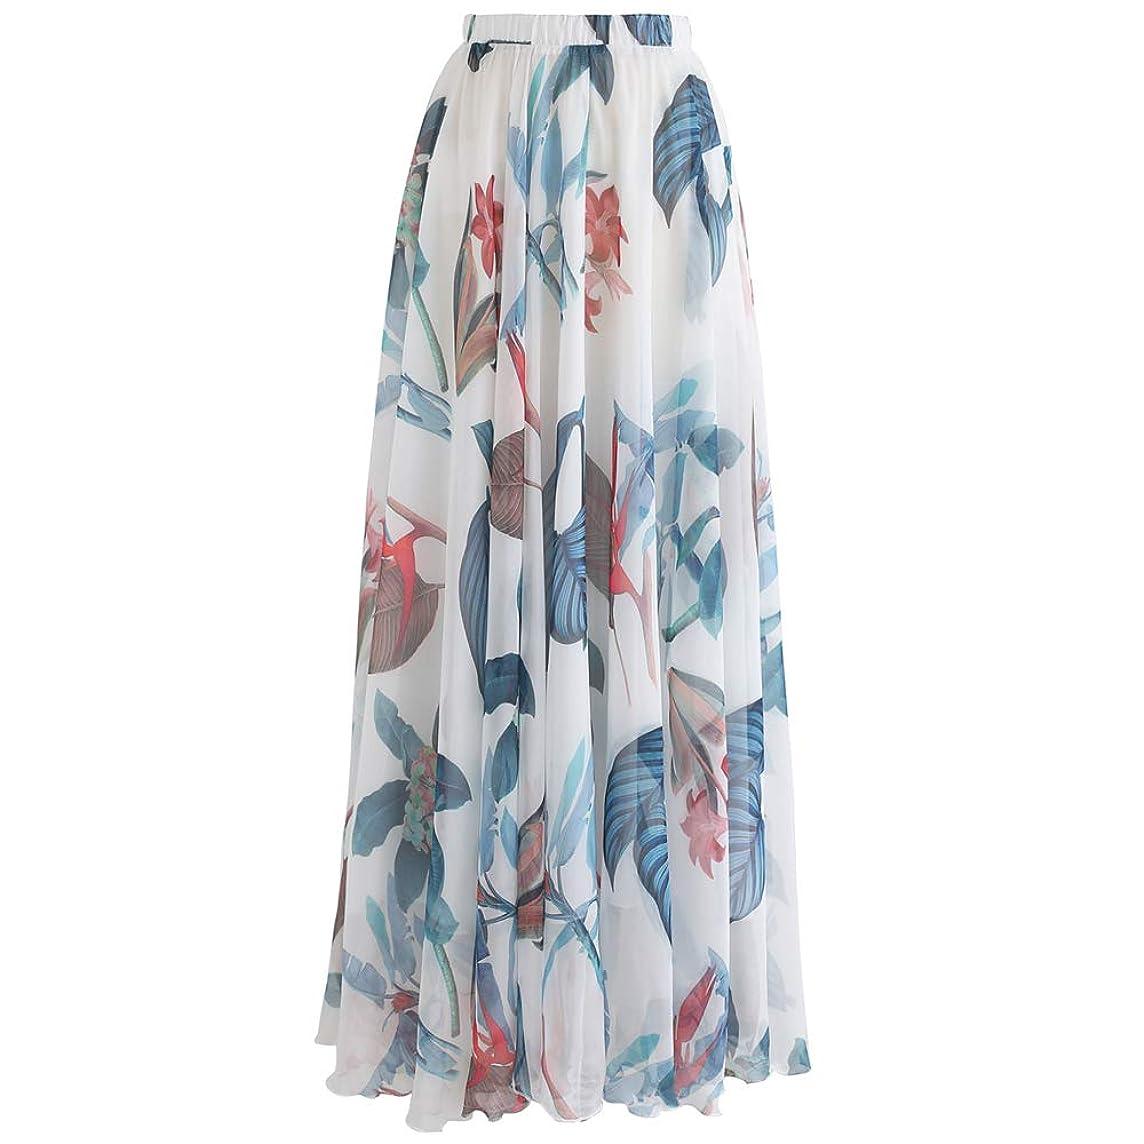 Chicwish Women's Watercolor Yellow/Violet/Green/Pink/Blue/Orange/Navy Flower Maxi Floral Chiffon Slip Skirt